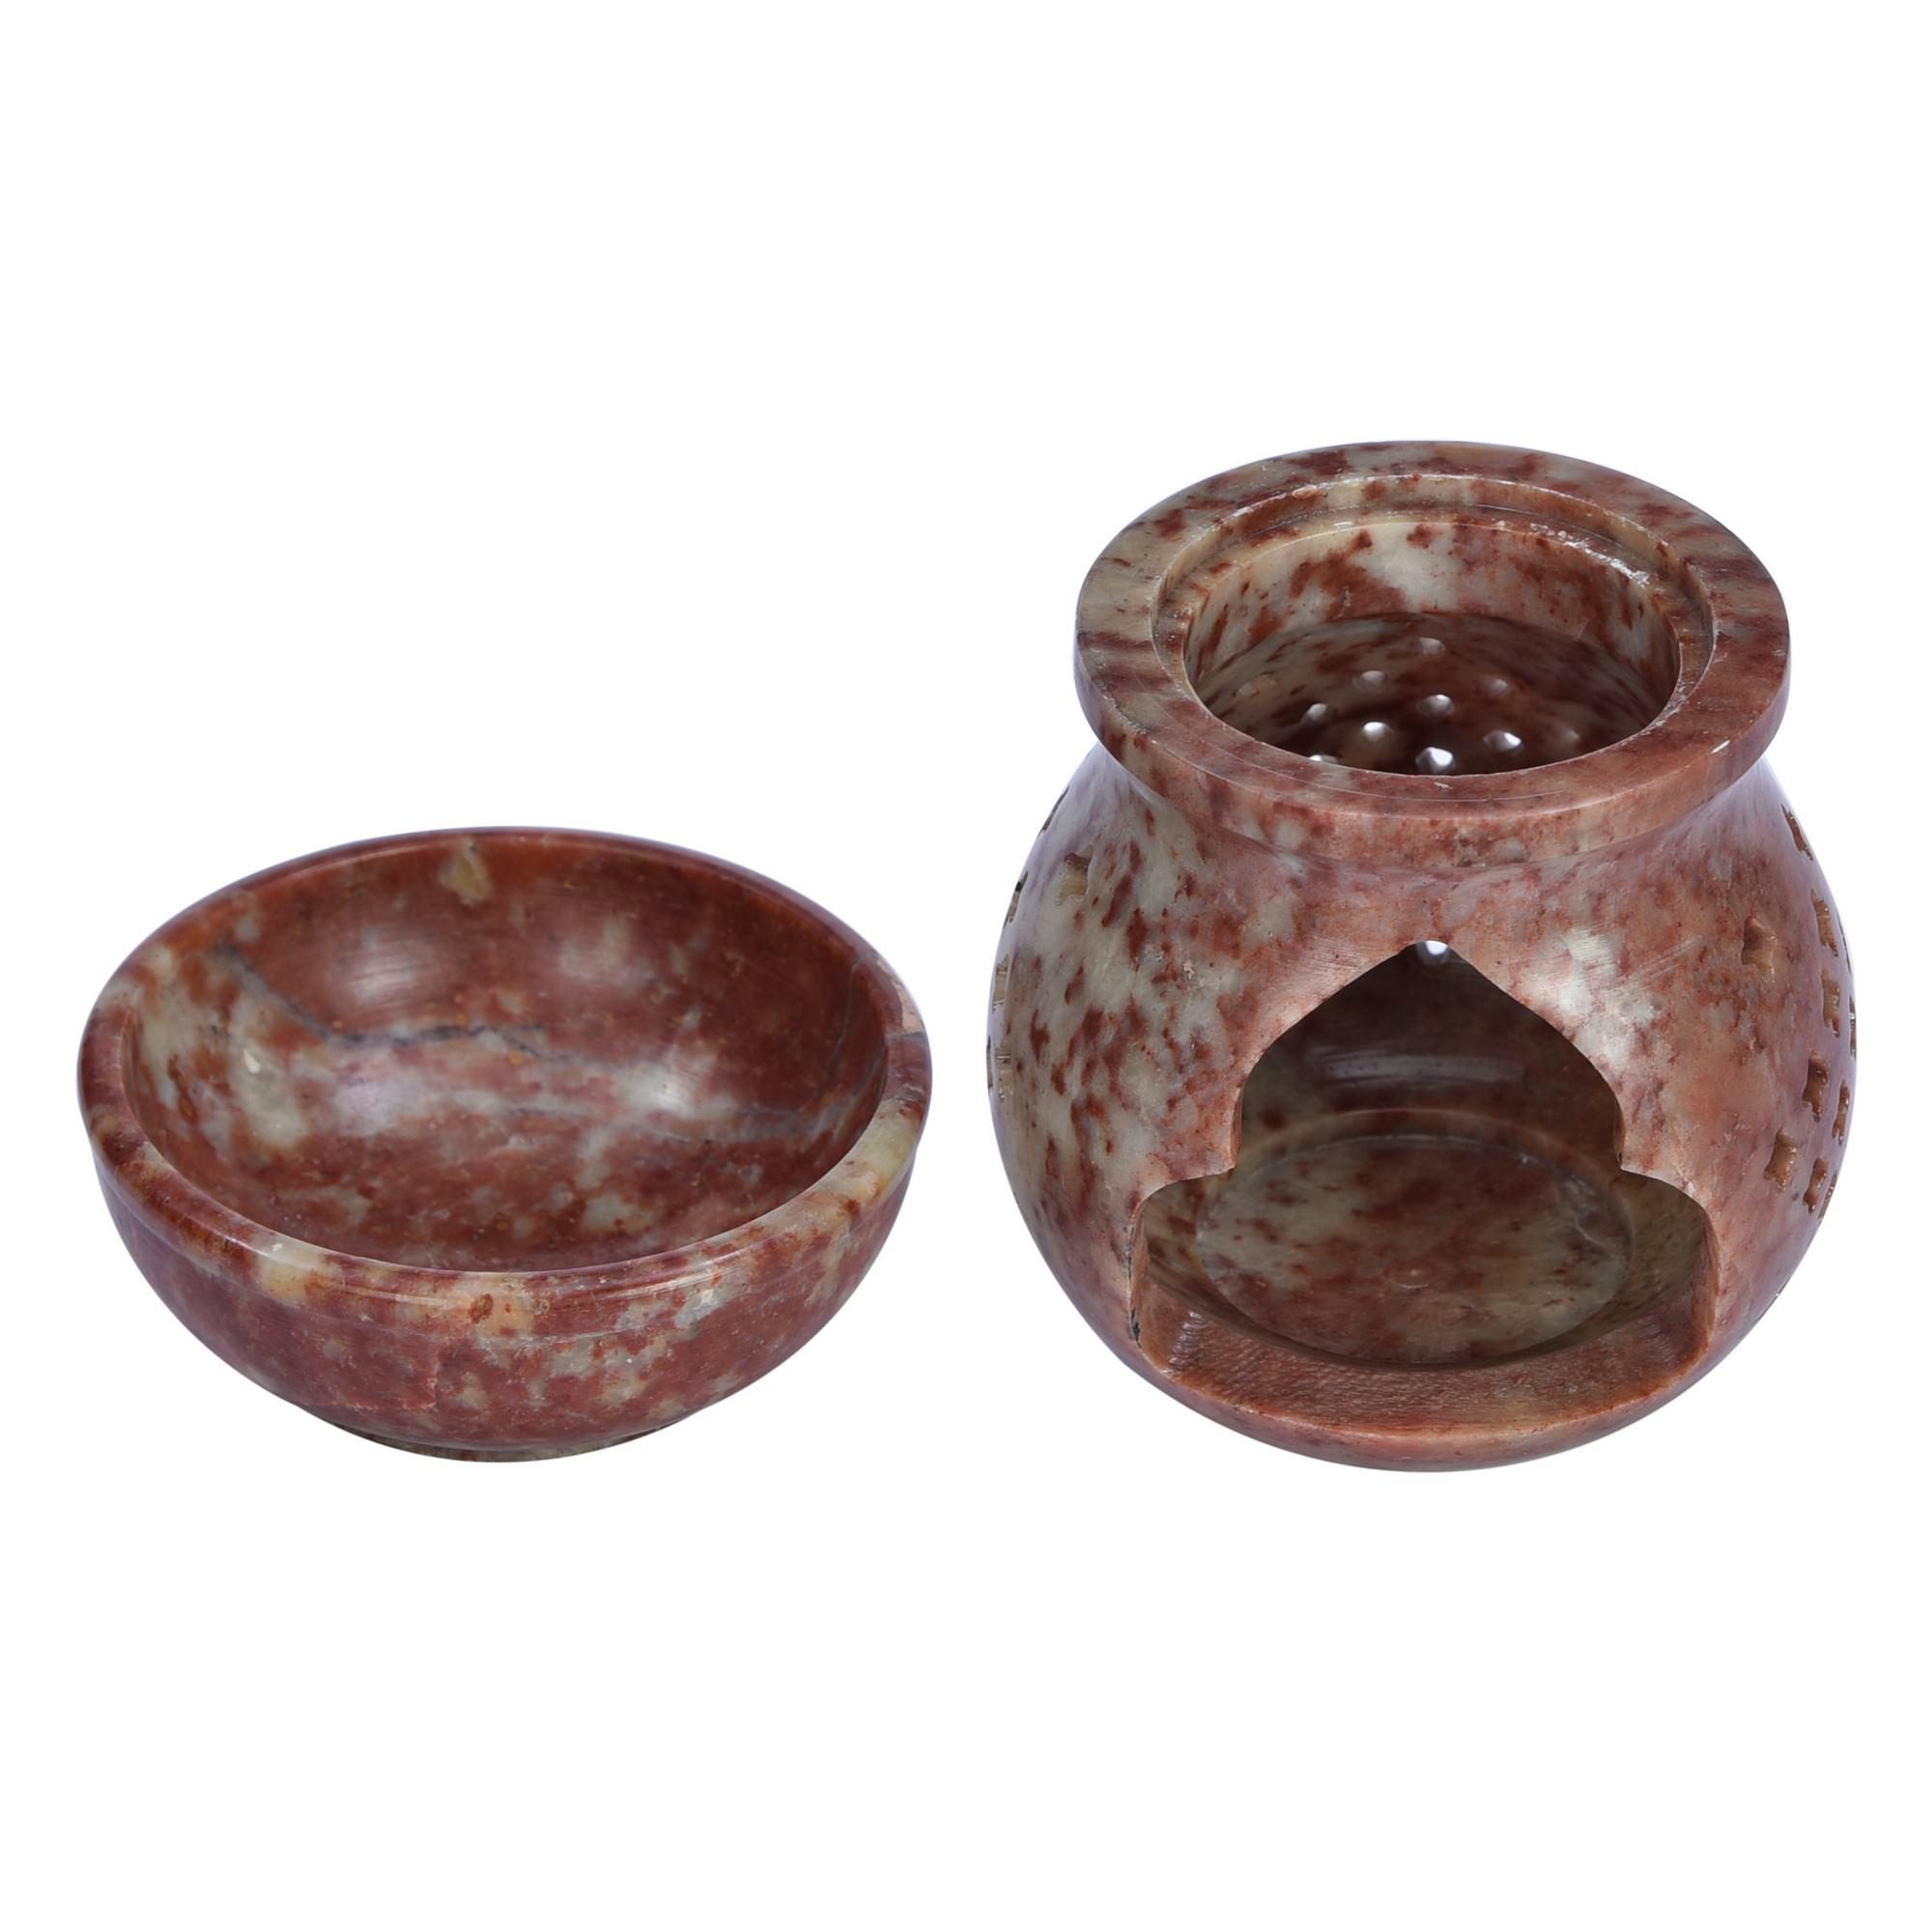 Cortez Handcrafted Soapstone Oil Burner